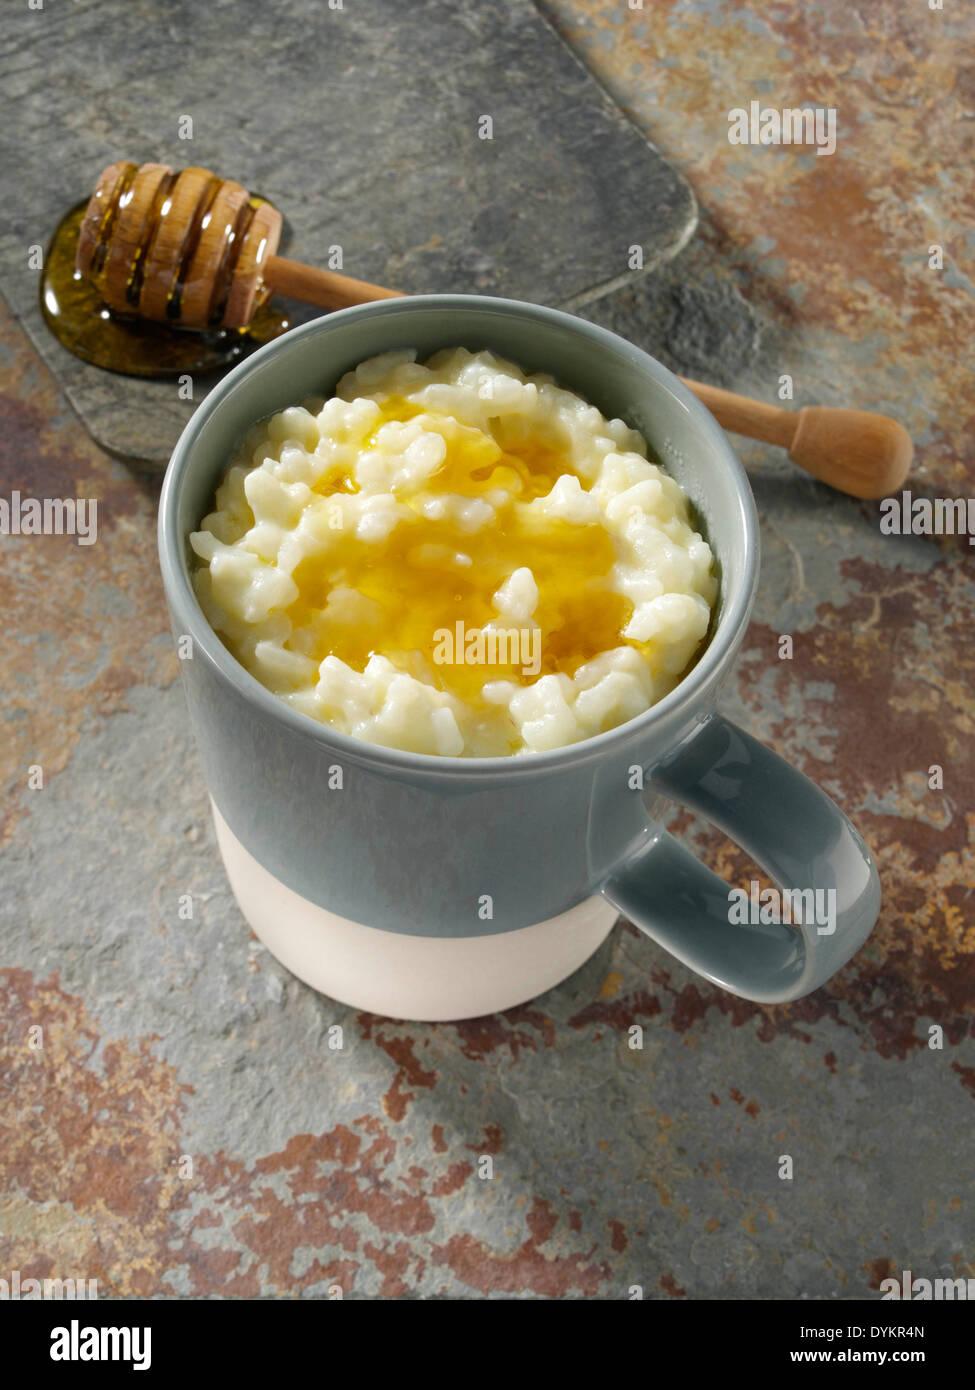 Rice pudding microwaved in a mug dessert - Stock Image